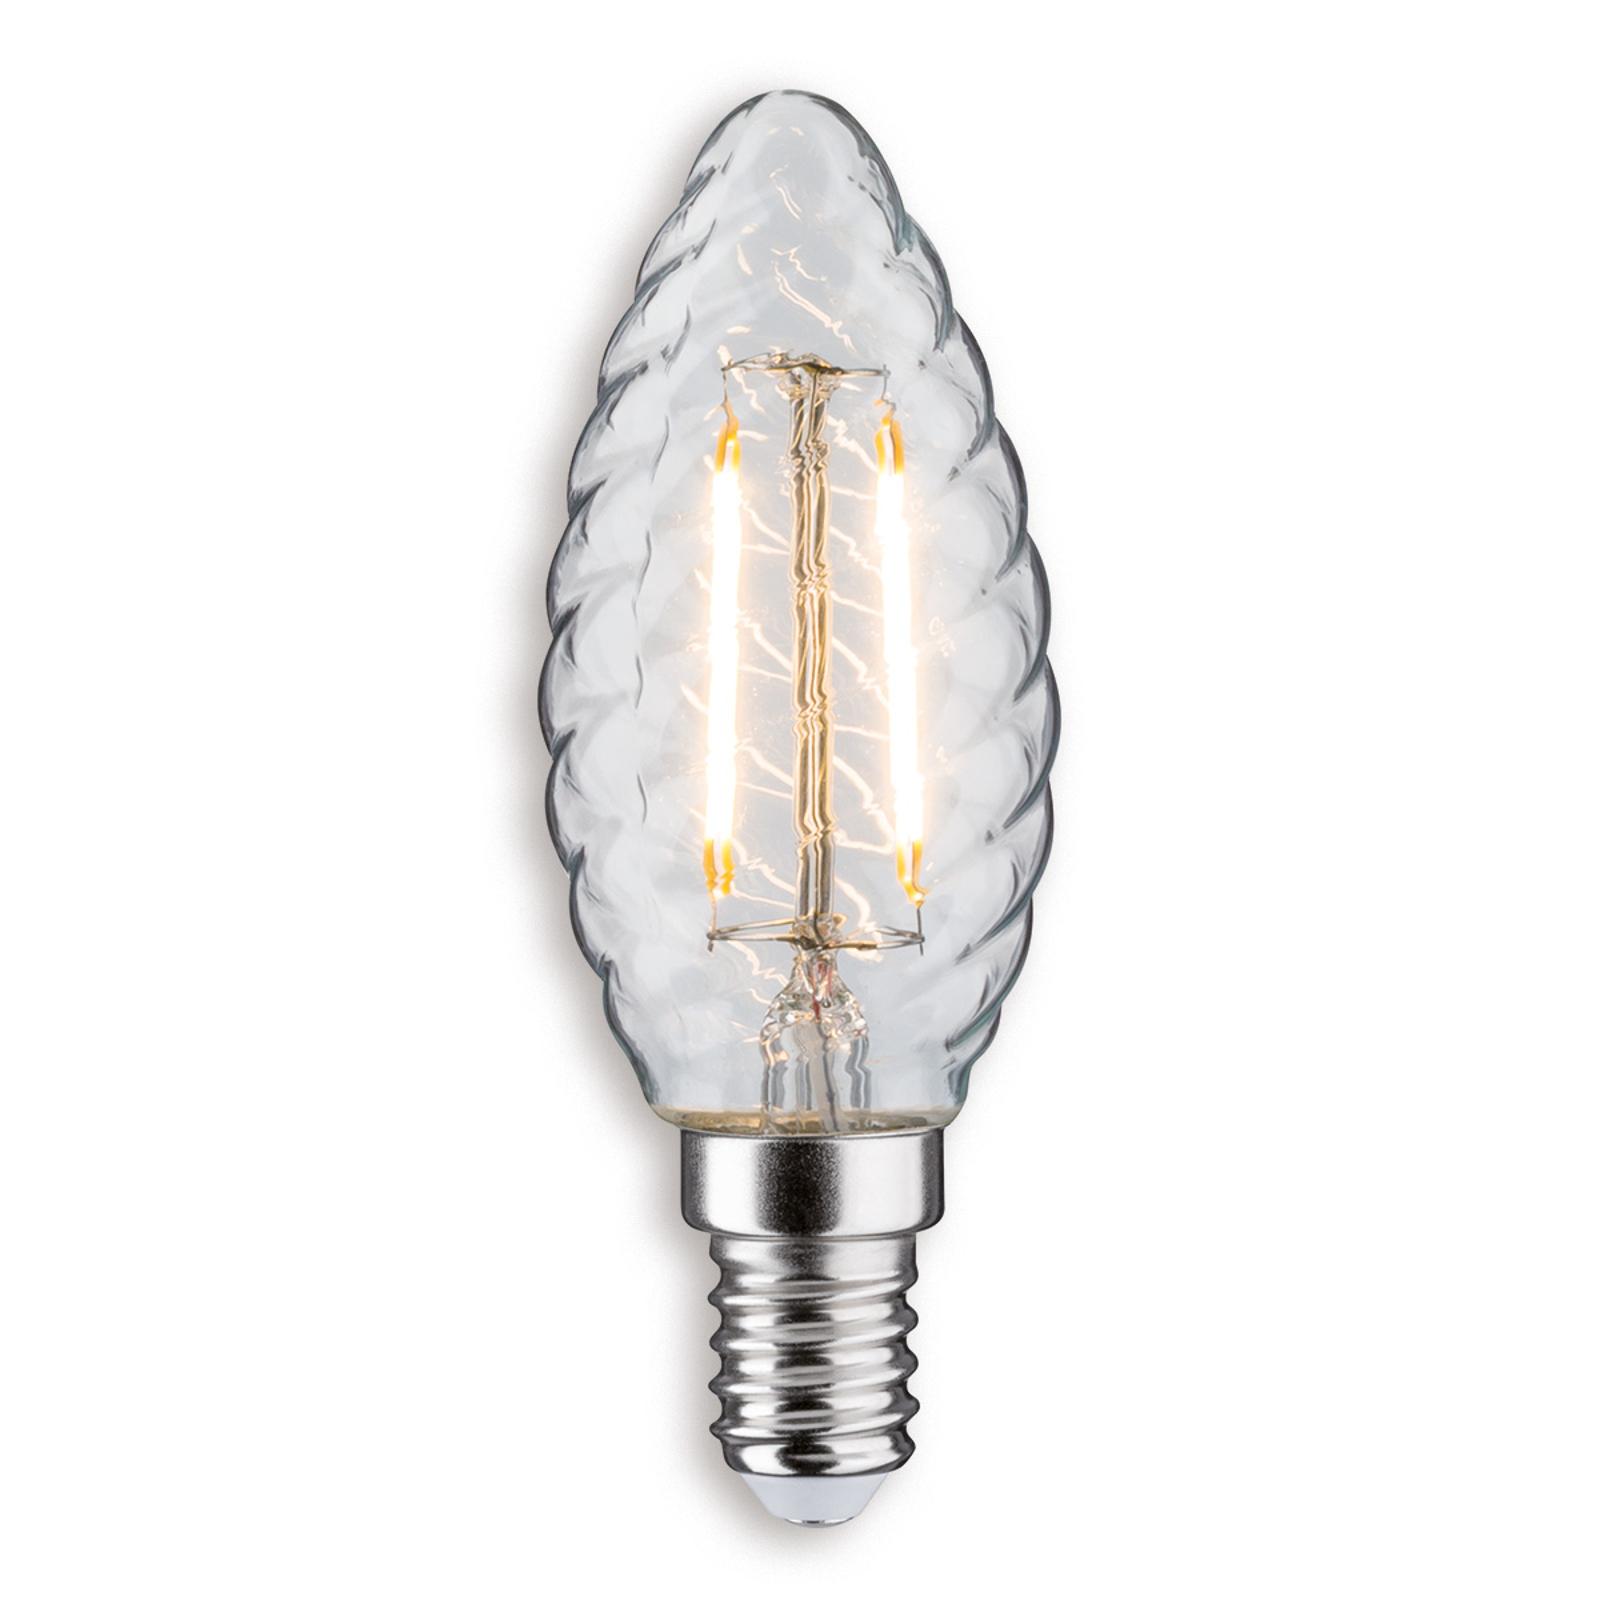 Paulmann E14 2,6W 827 LED-Kerzenlampe gedreht klar